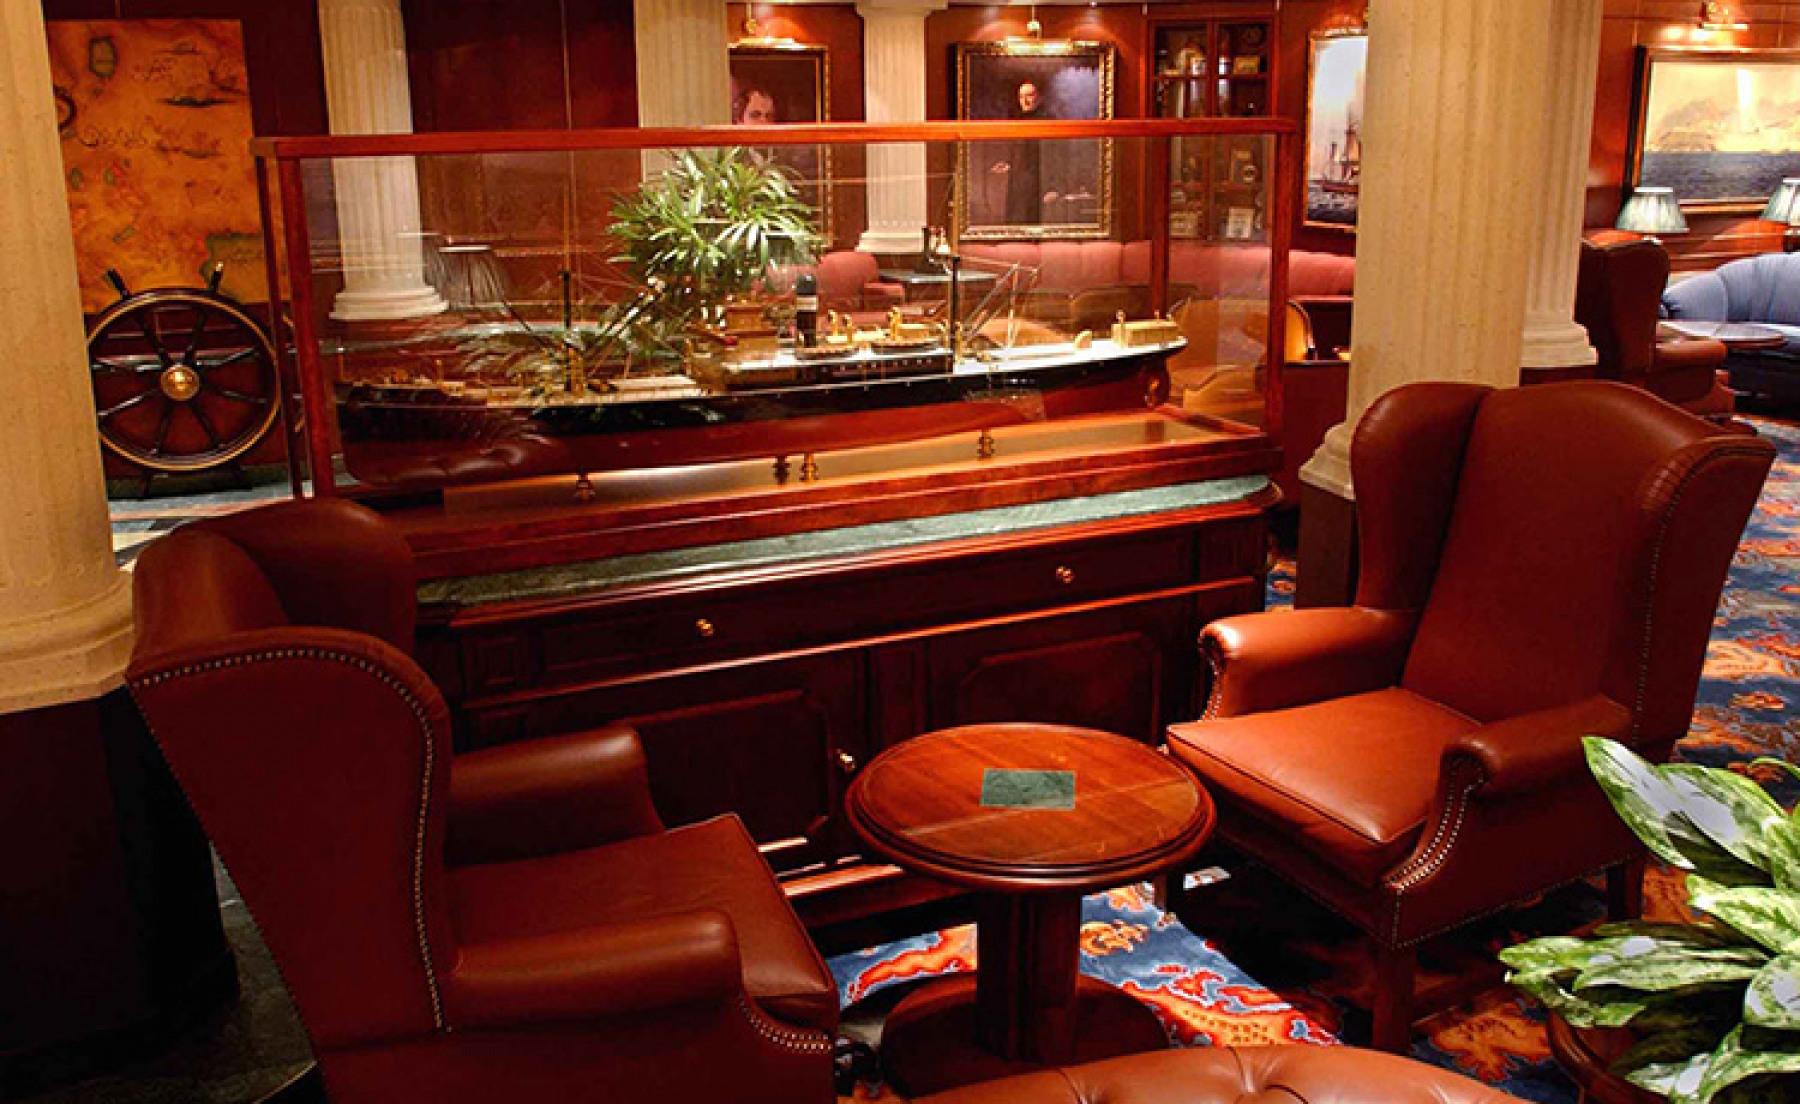 Princess cruises grand class wheelhouse bar.jpeg